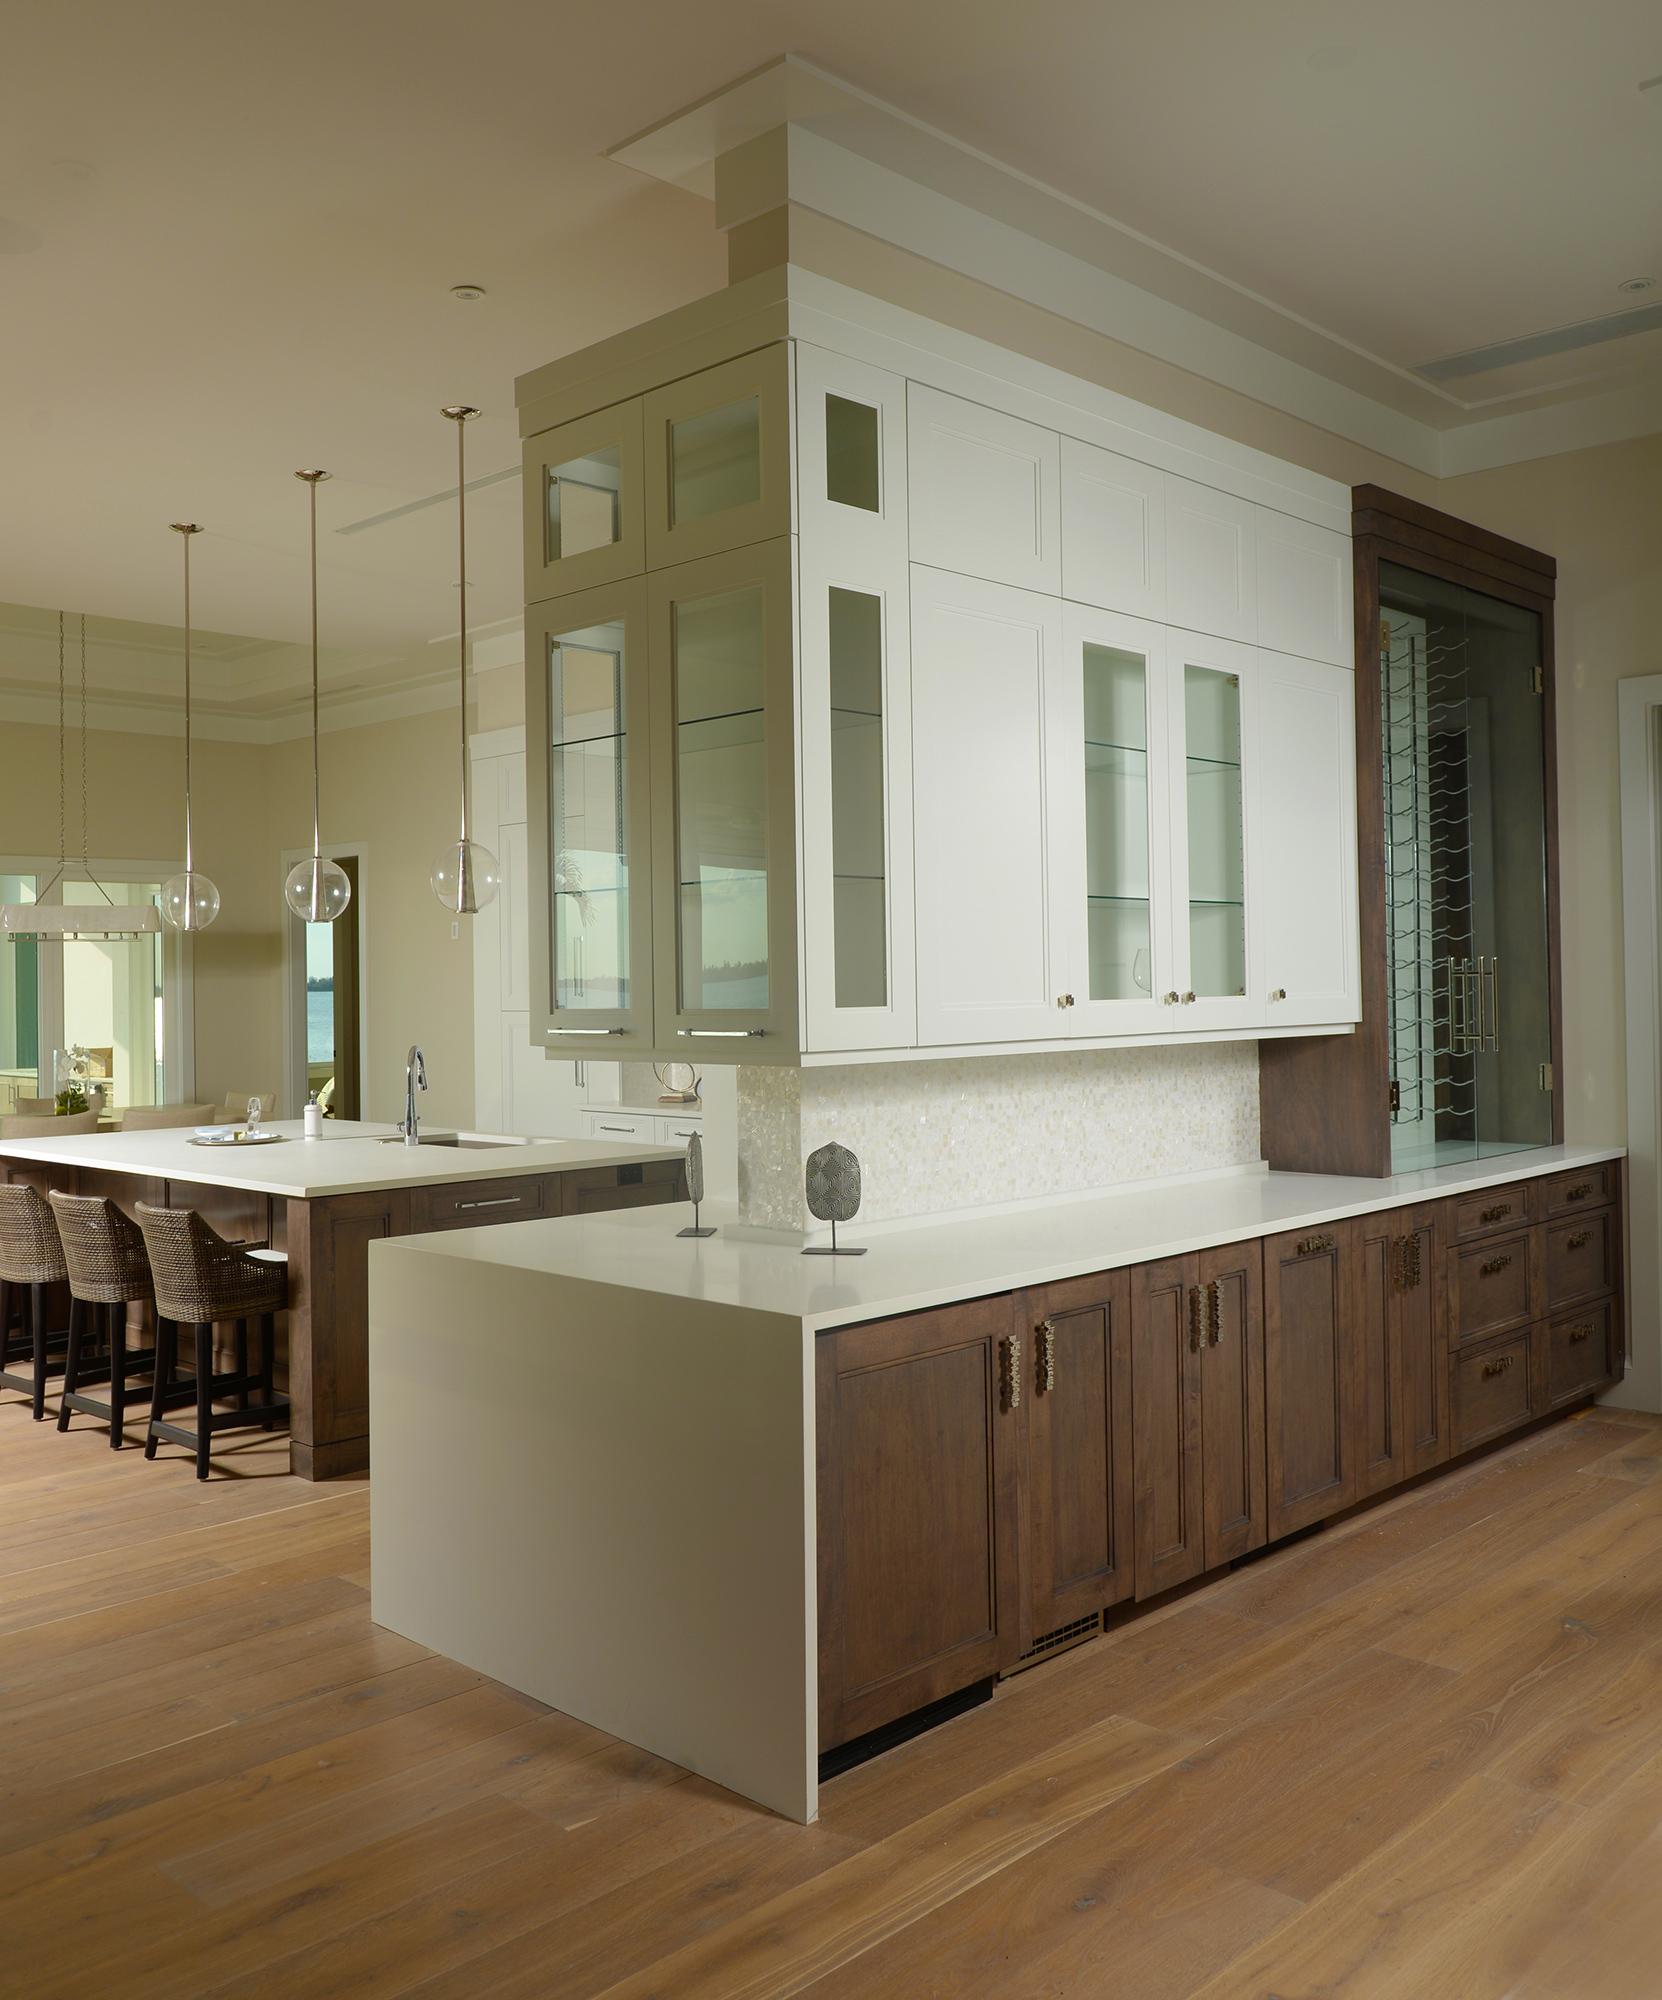 Bathroom Remodeling Vero Beach Fl luxury kitchen photos | dunlap construction | vero beach fl